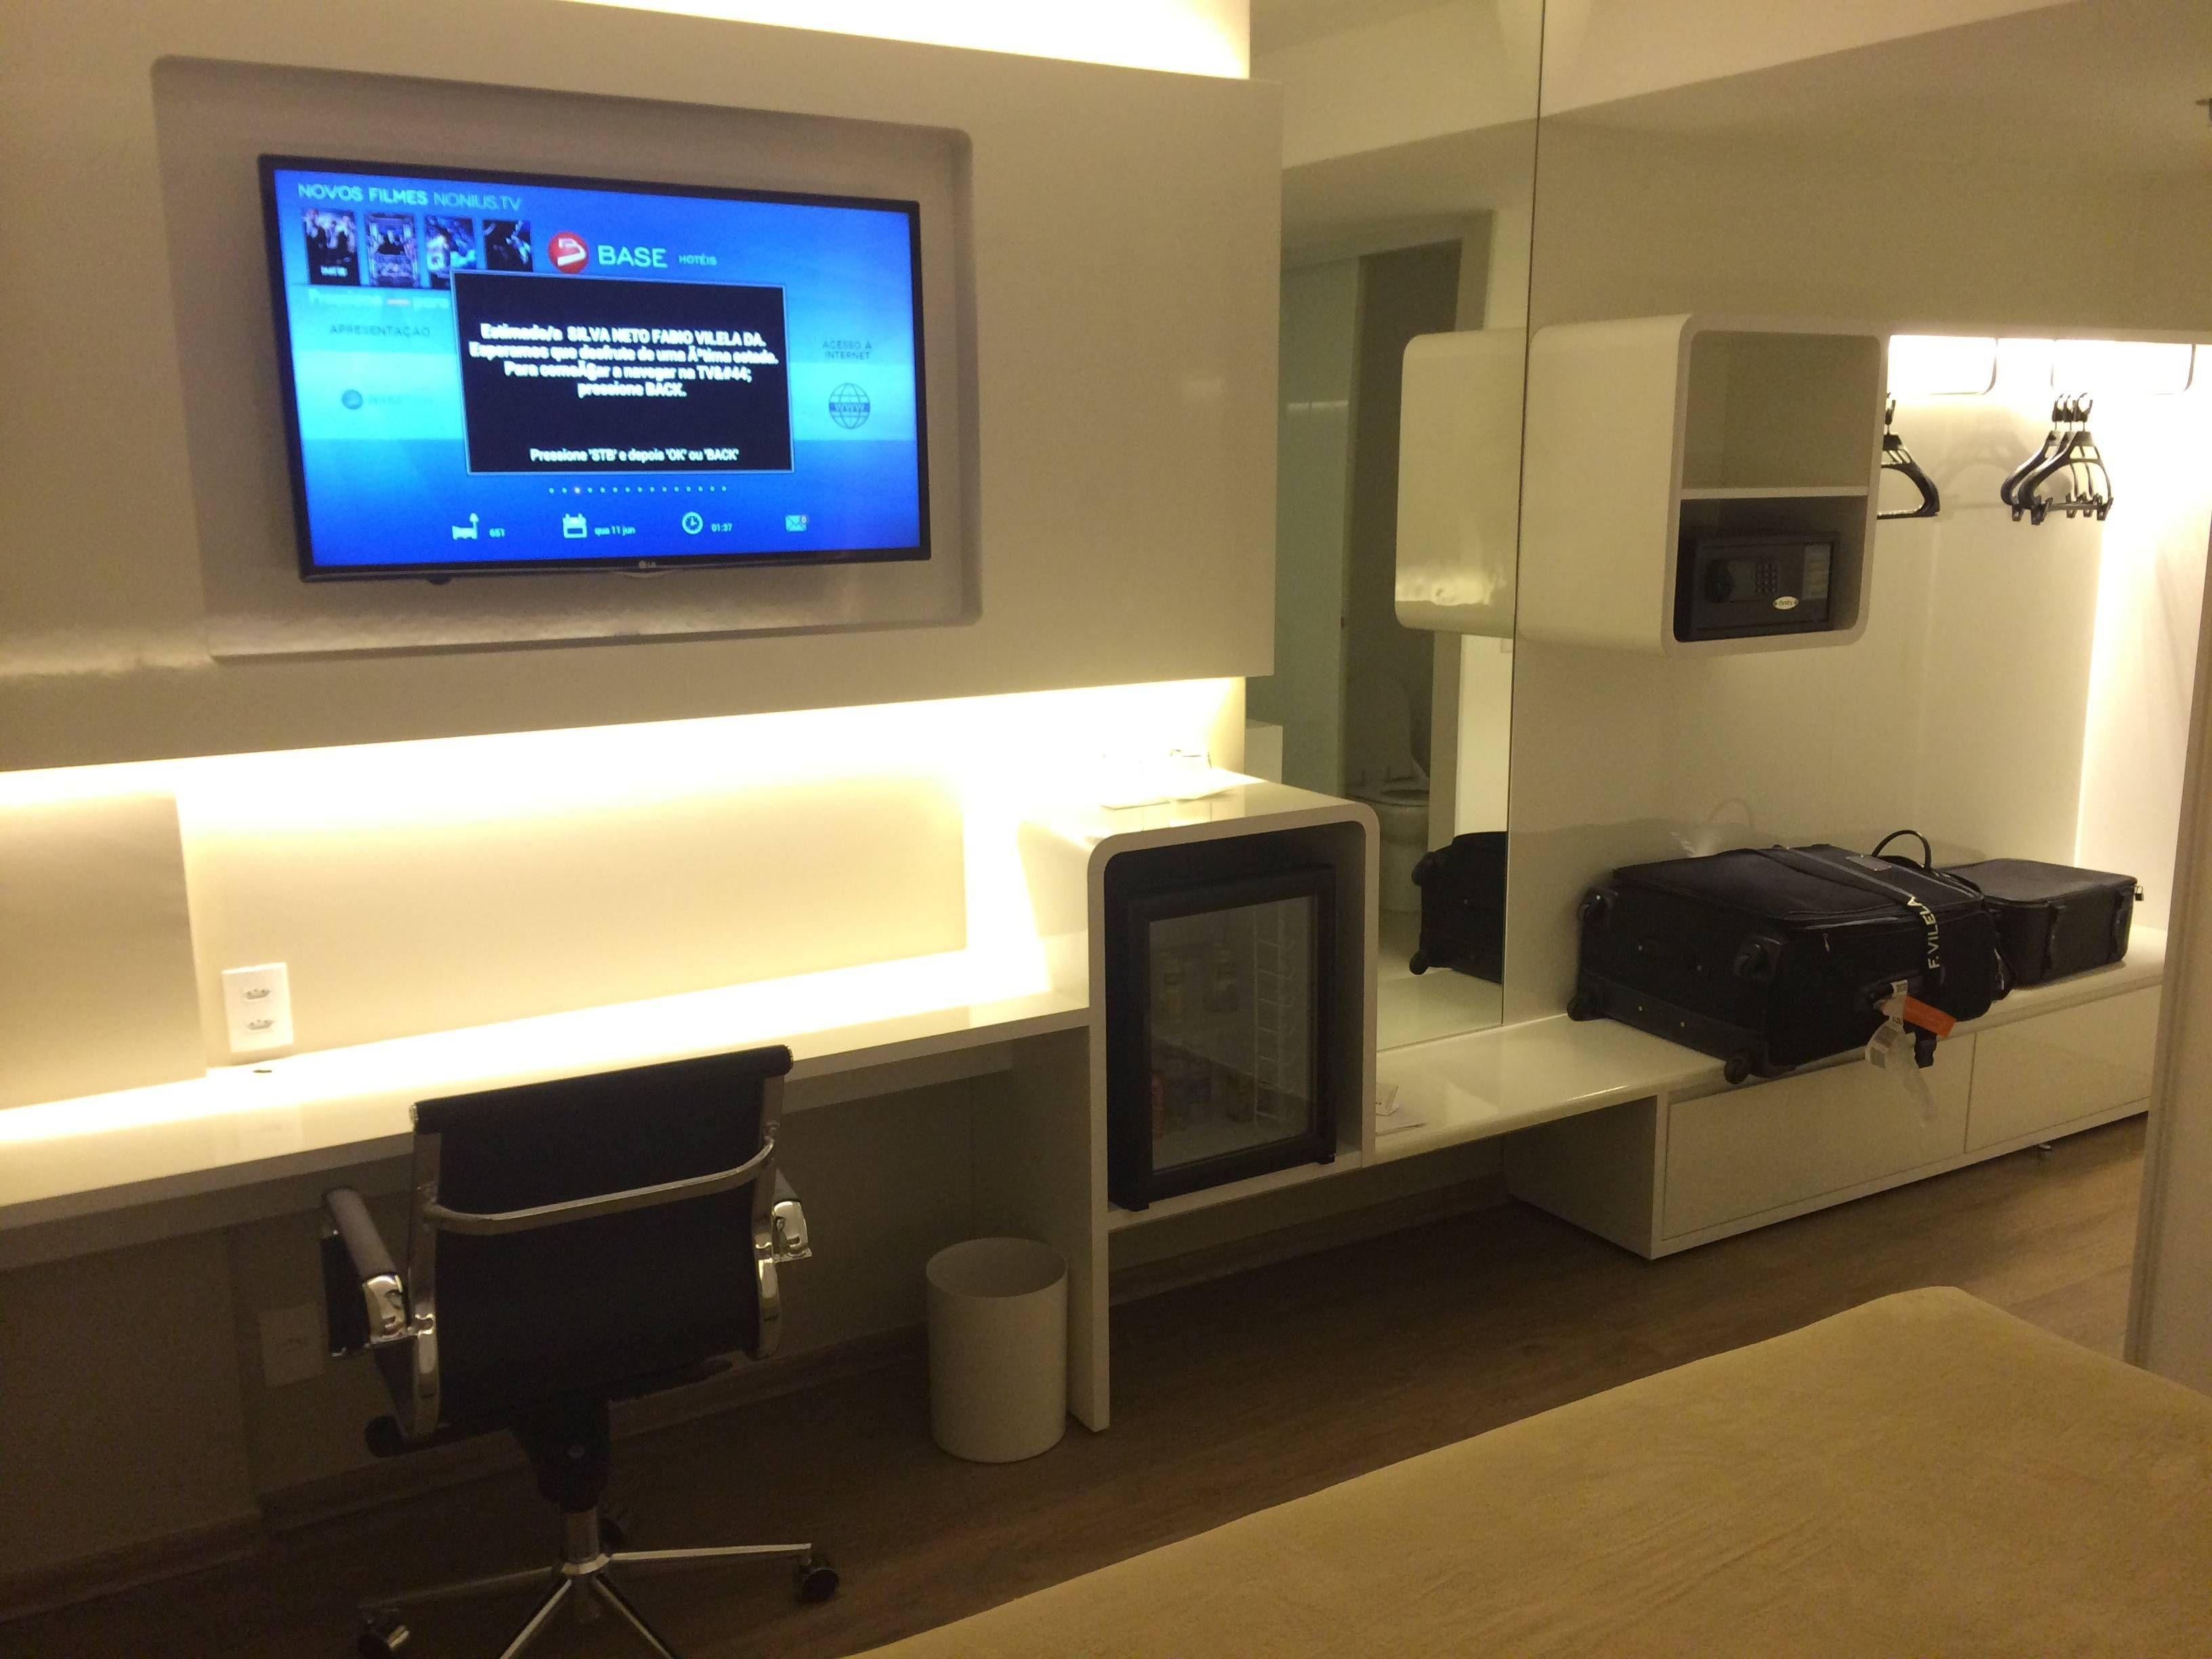 Base Concept Hotel no Aeroporto de Brasilia